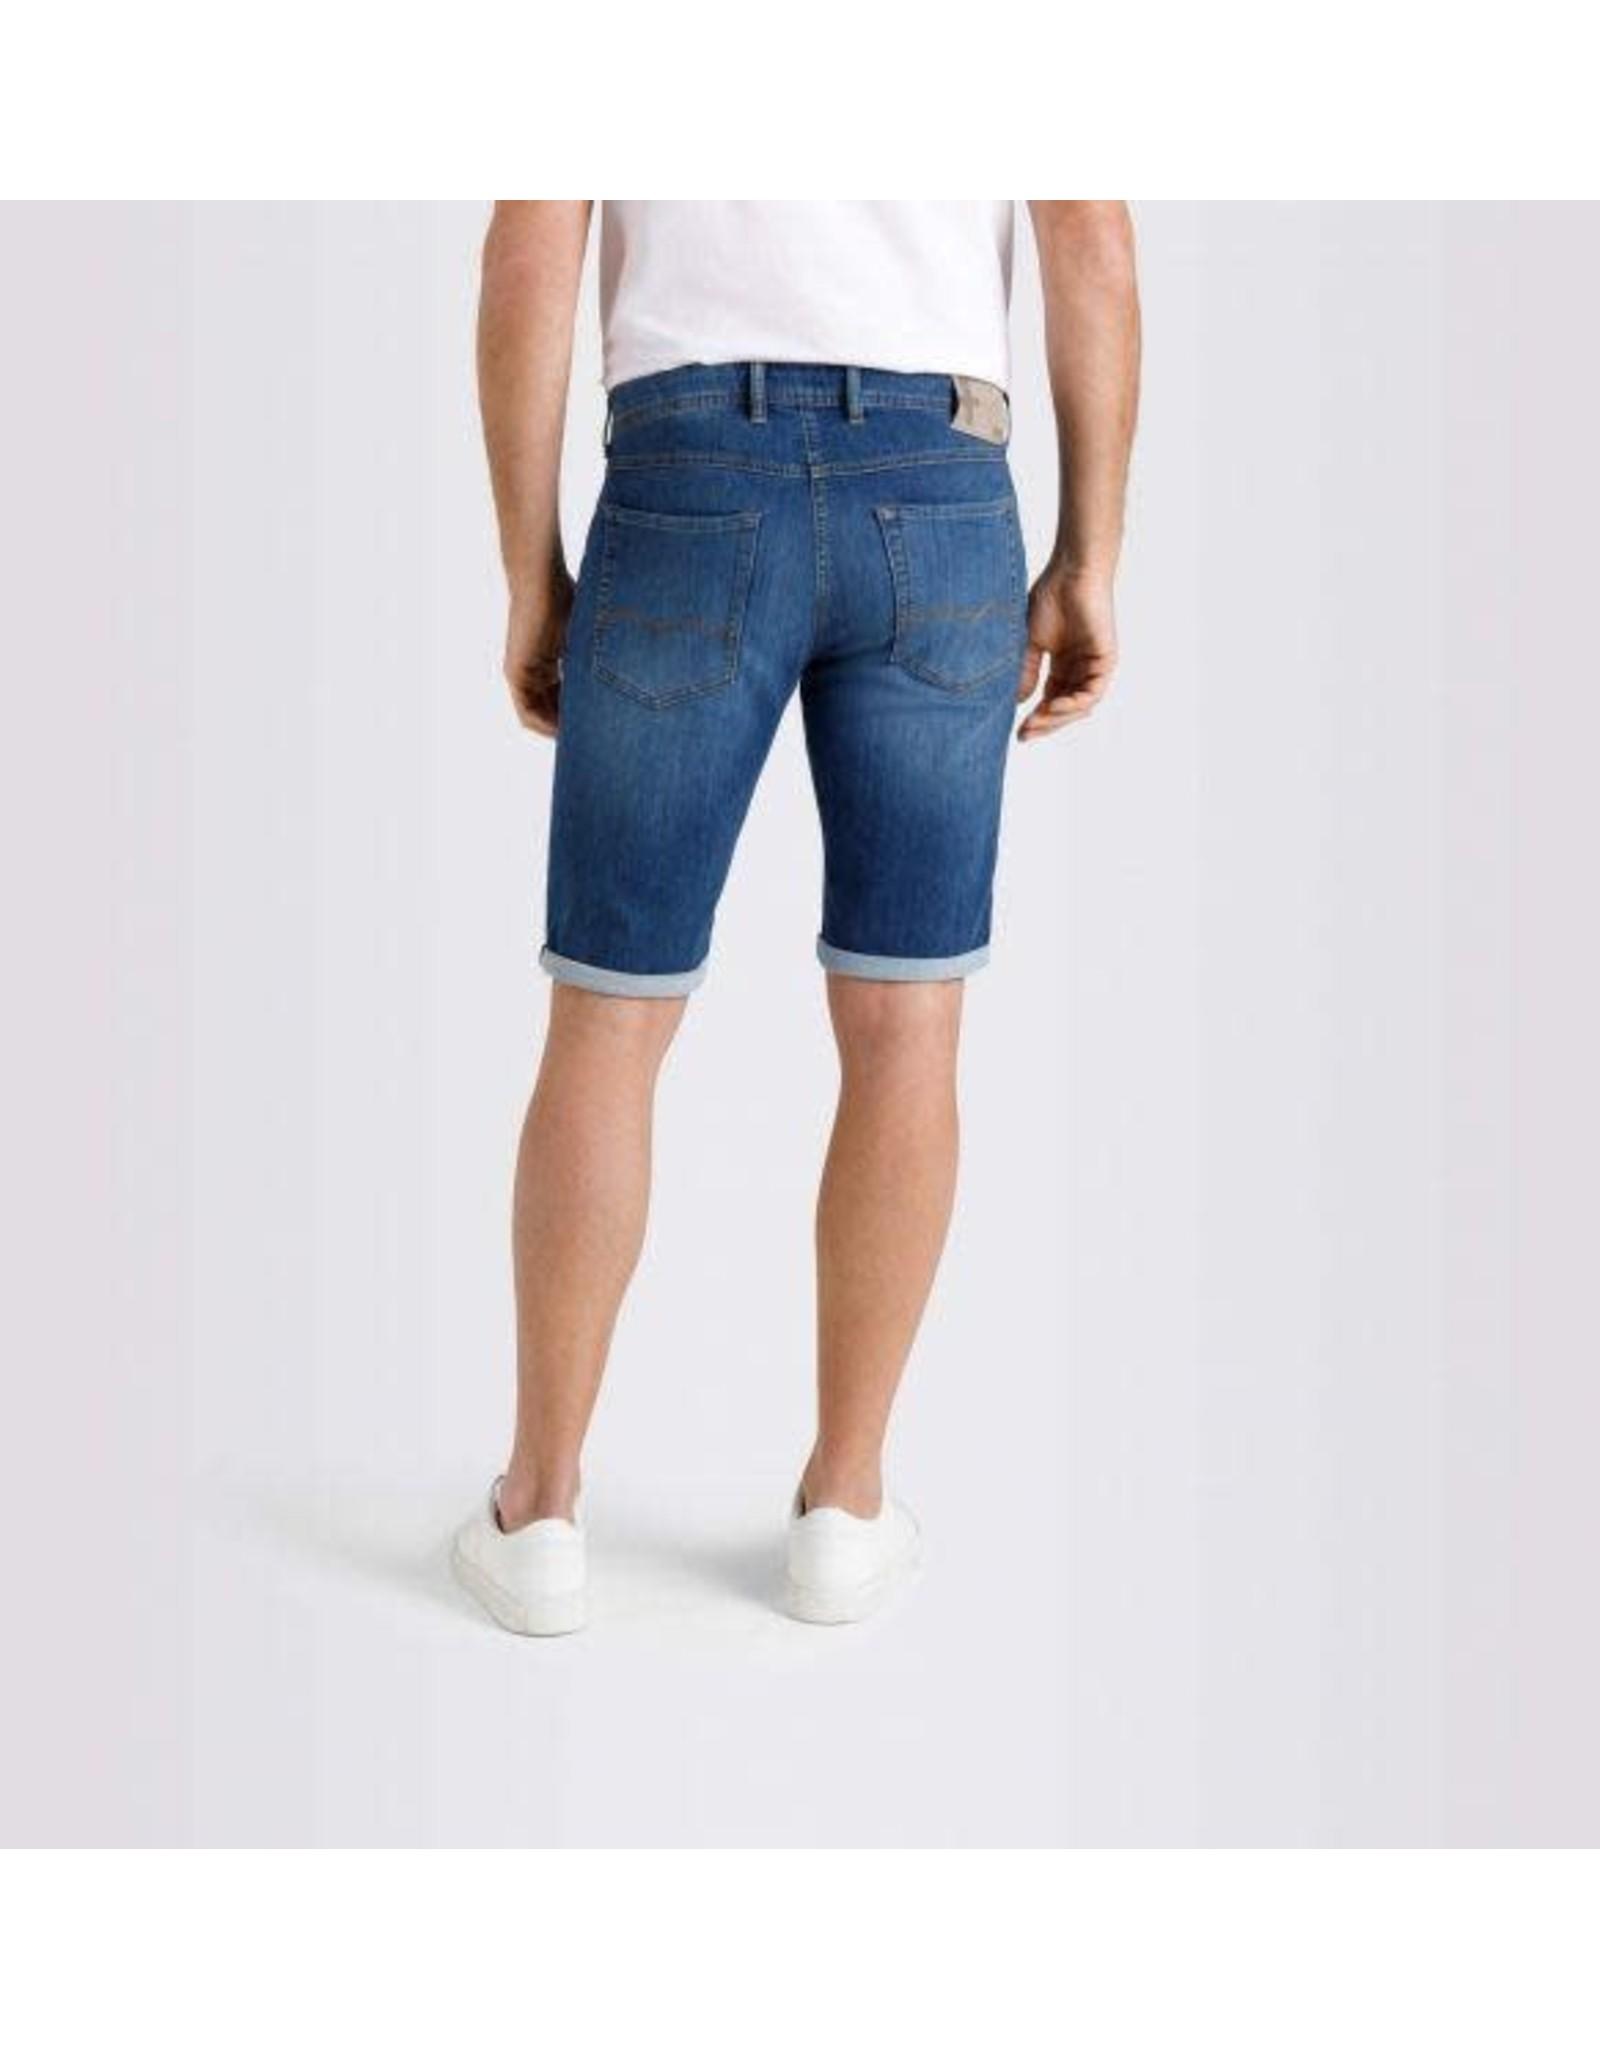 MAC Mens Jog n Short